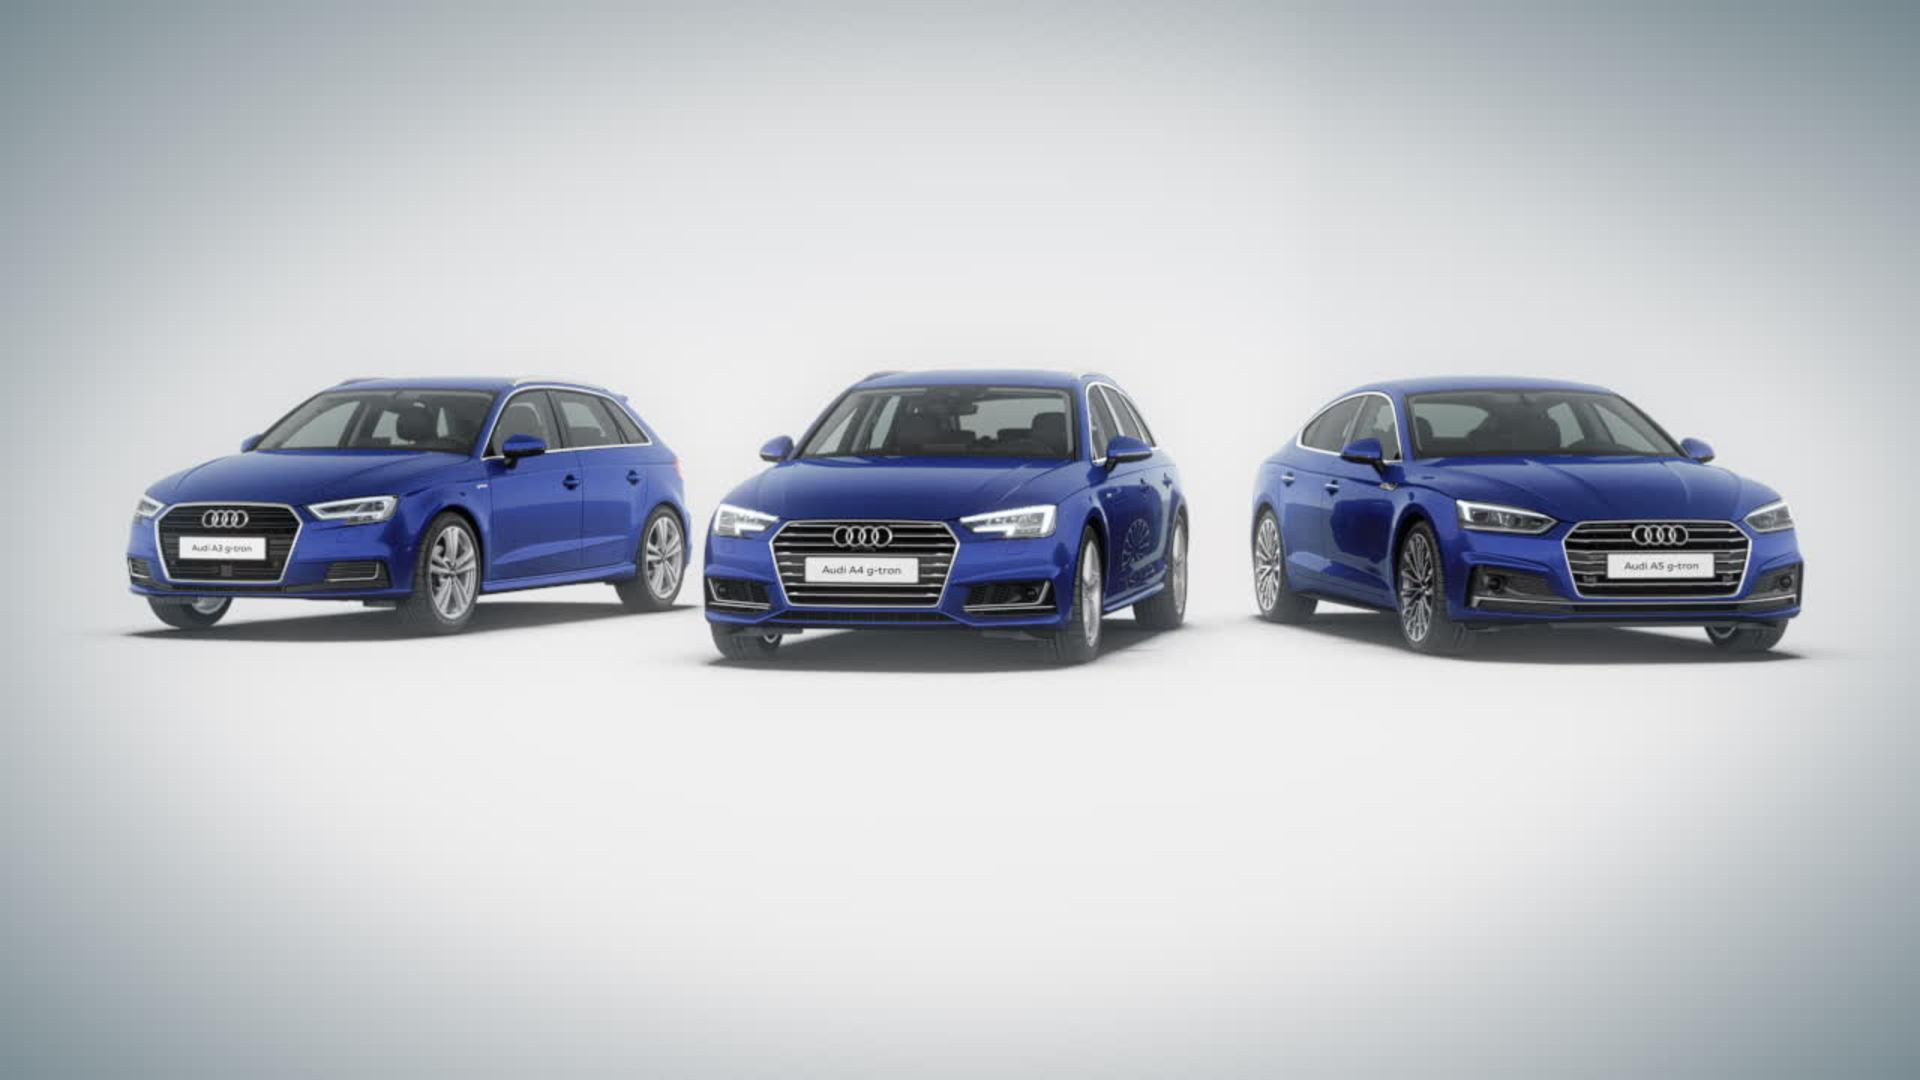 Audi g-tron Langstreckenmobilität - Animation